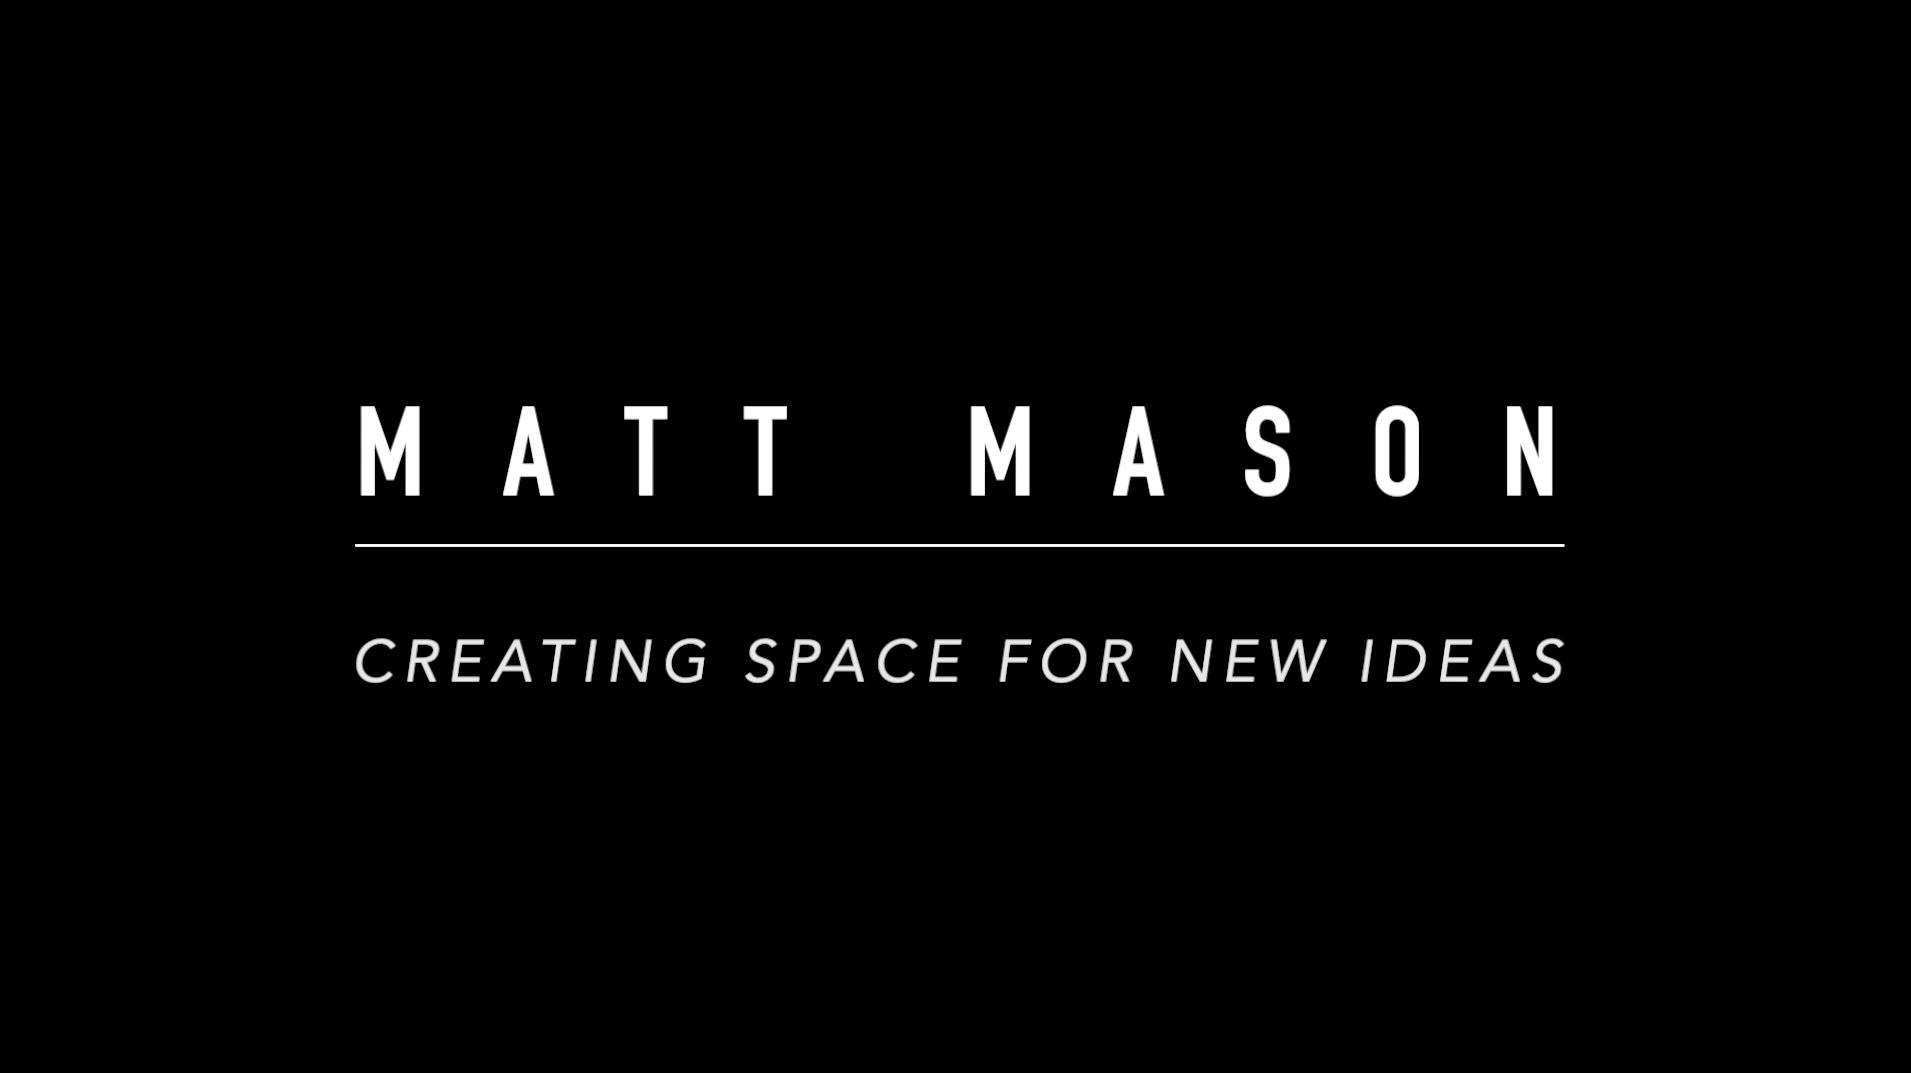 Matt Mason - Creating Space